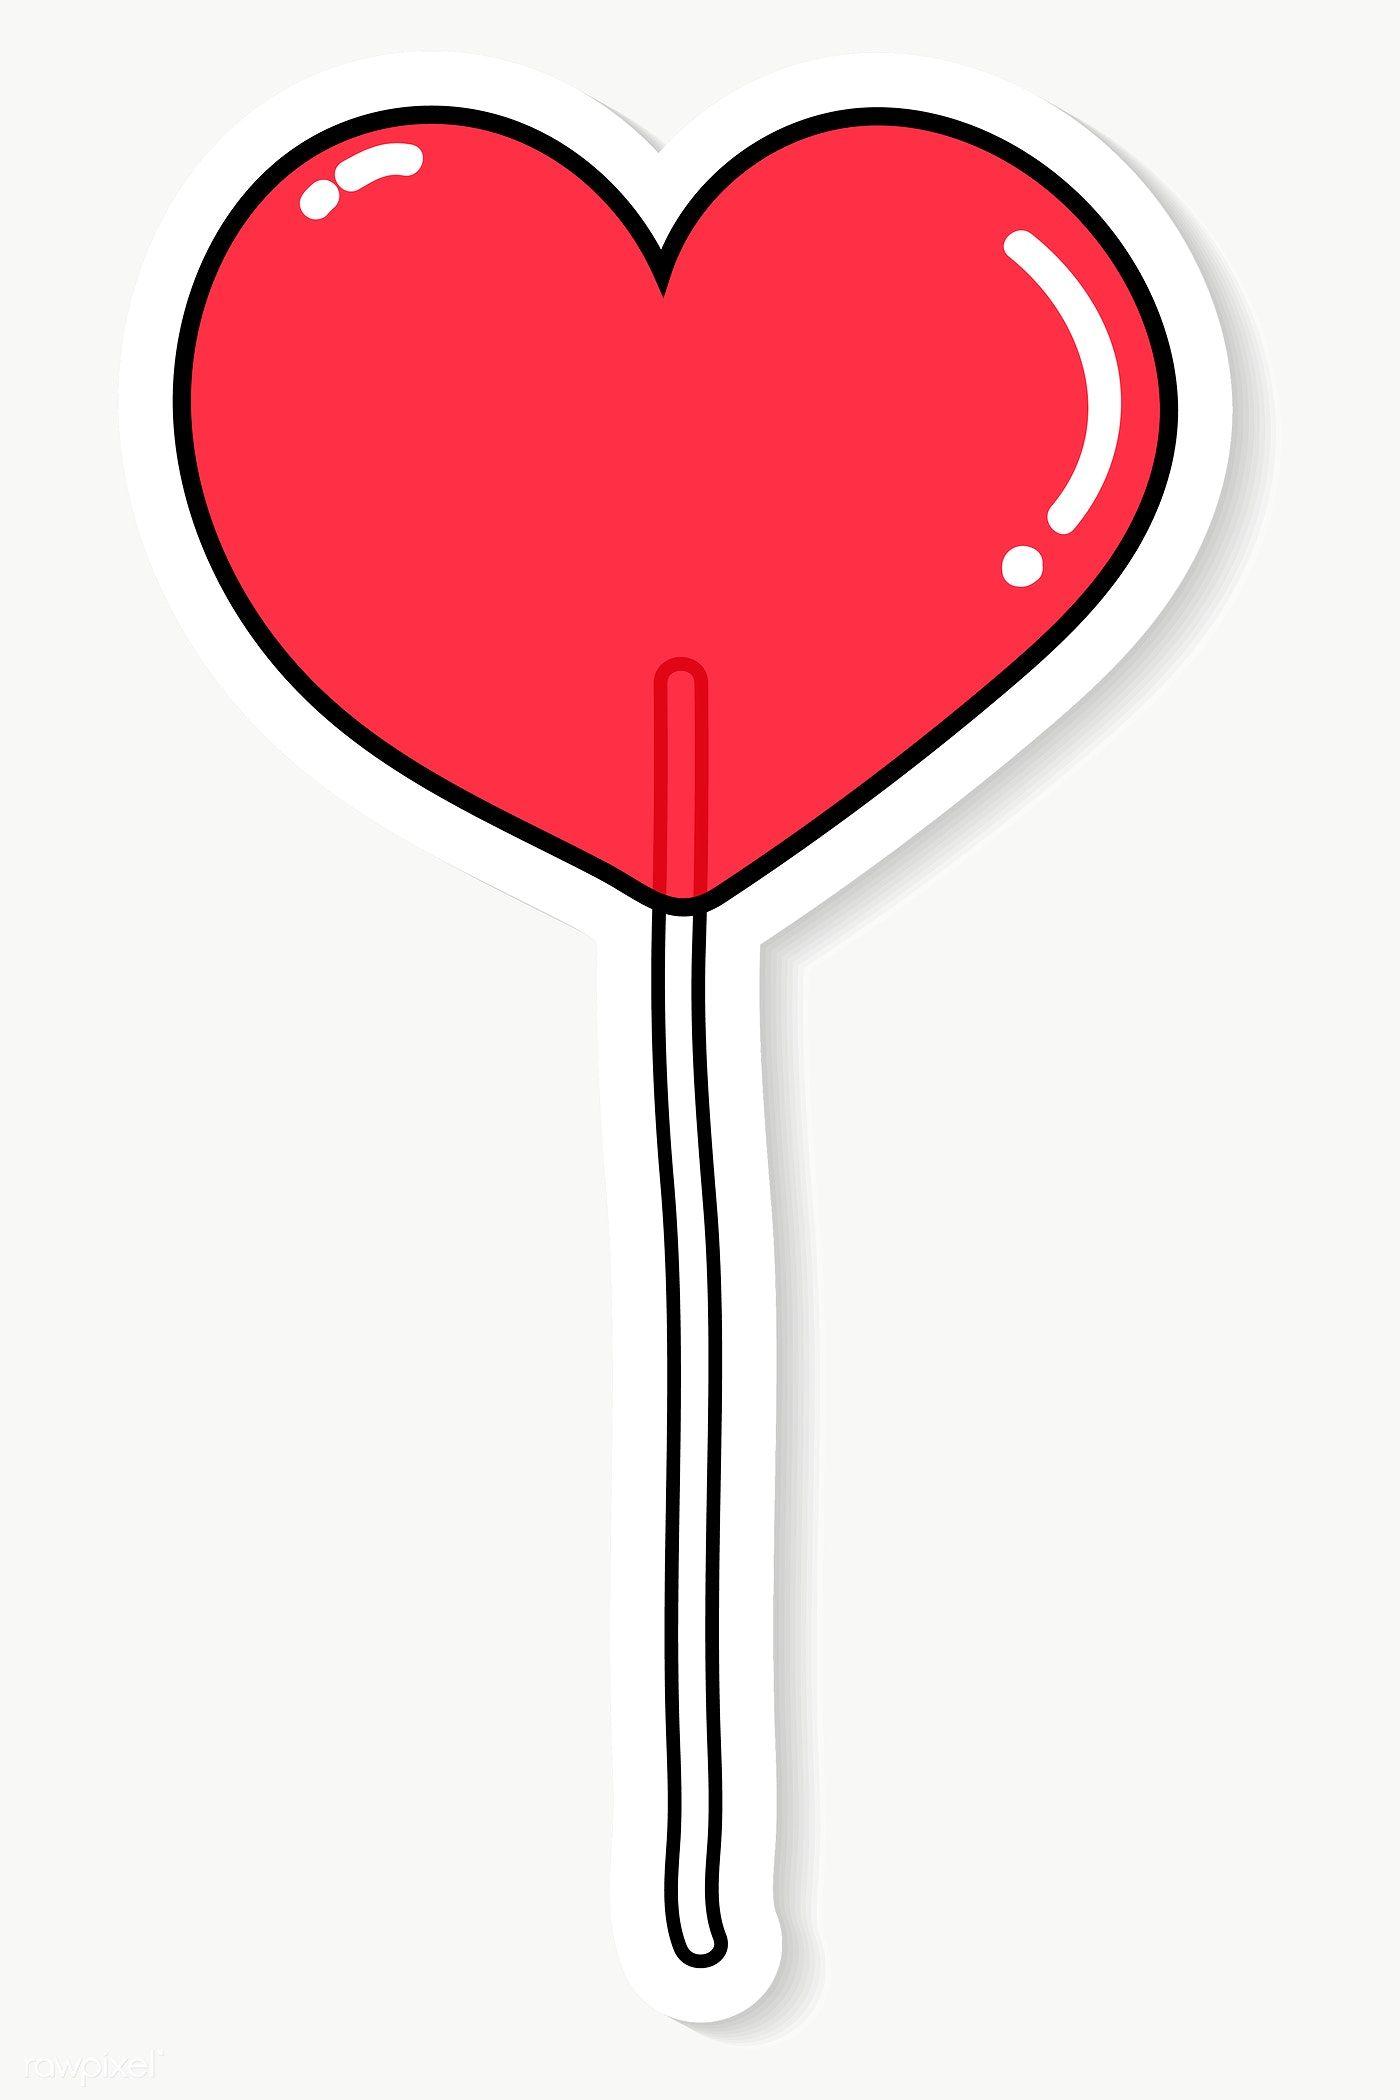 Download Premium Png Of Red Heart Lollipop Transparent Png 2034547